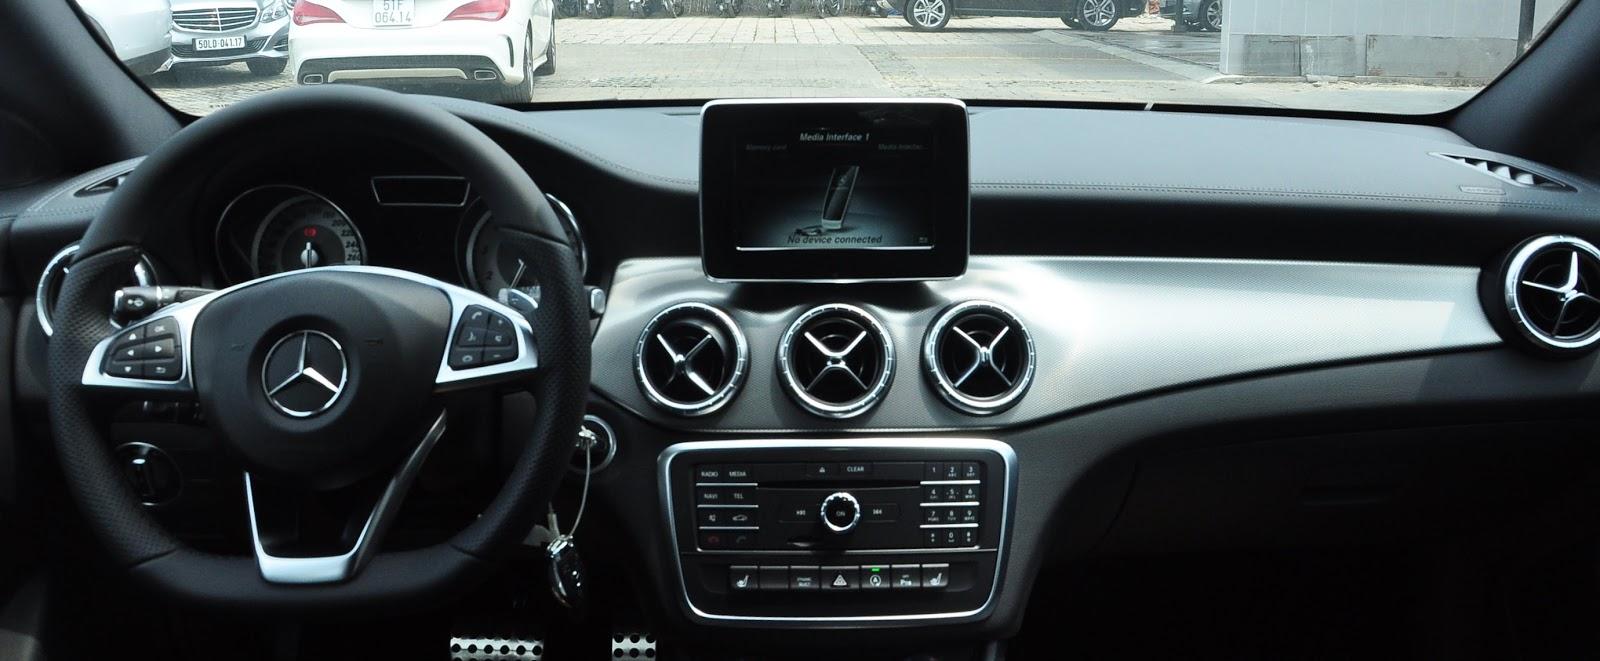 Nội thất xe Mercedes Benz CLA250 4MATIC New Model 02